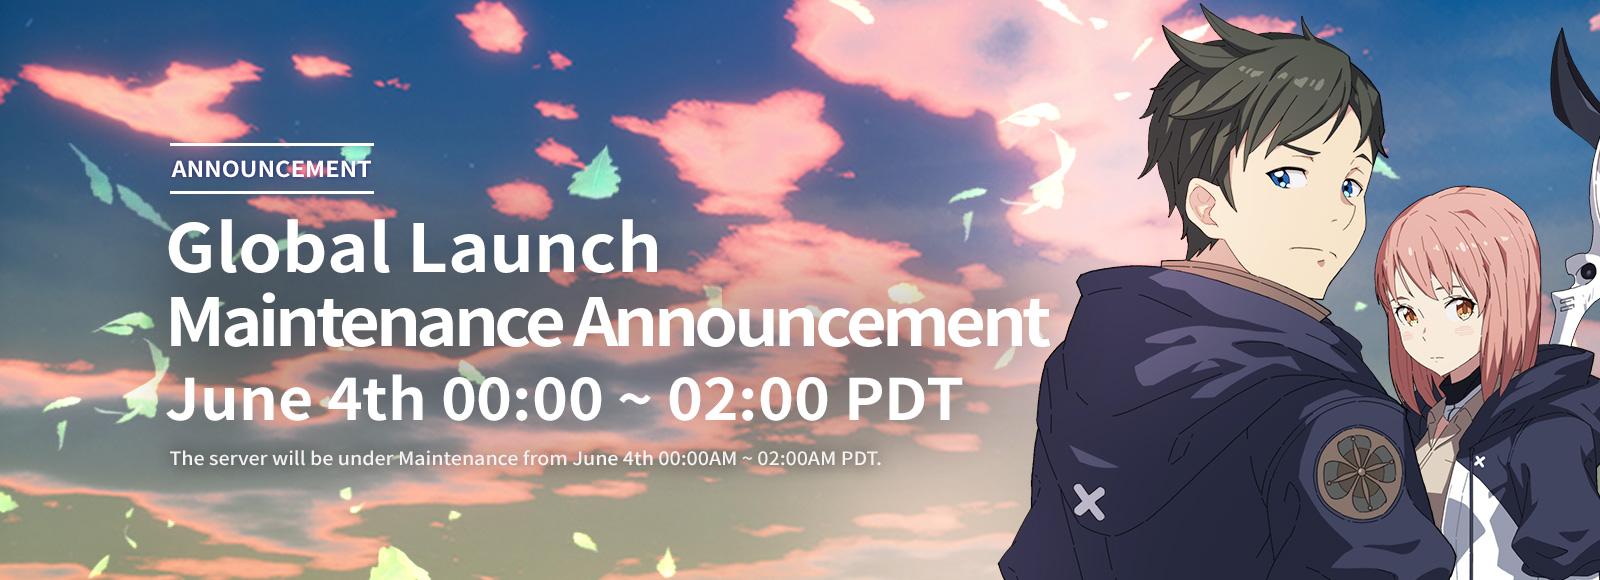 Global Launch Maintenance Announcement